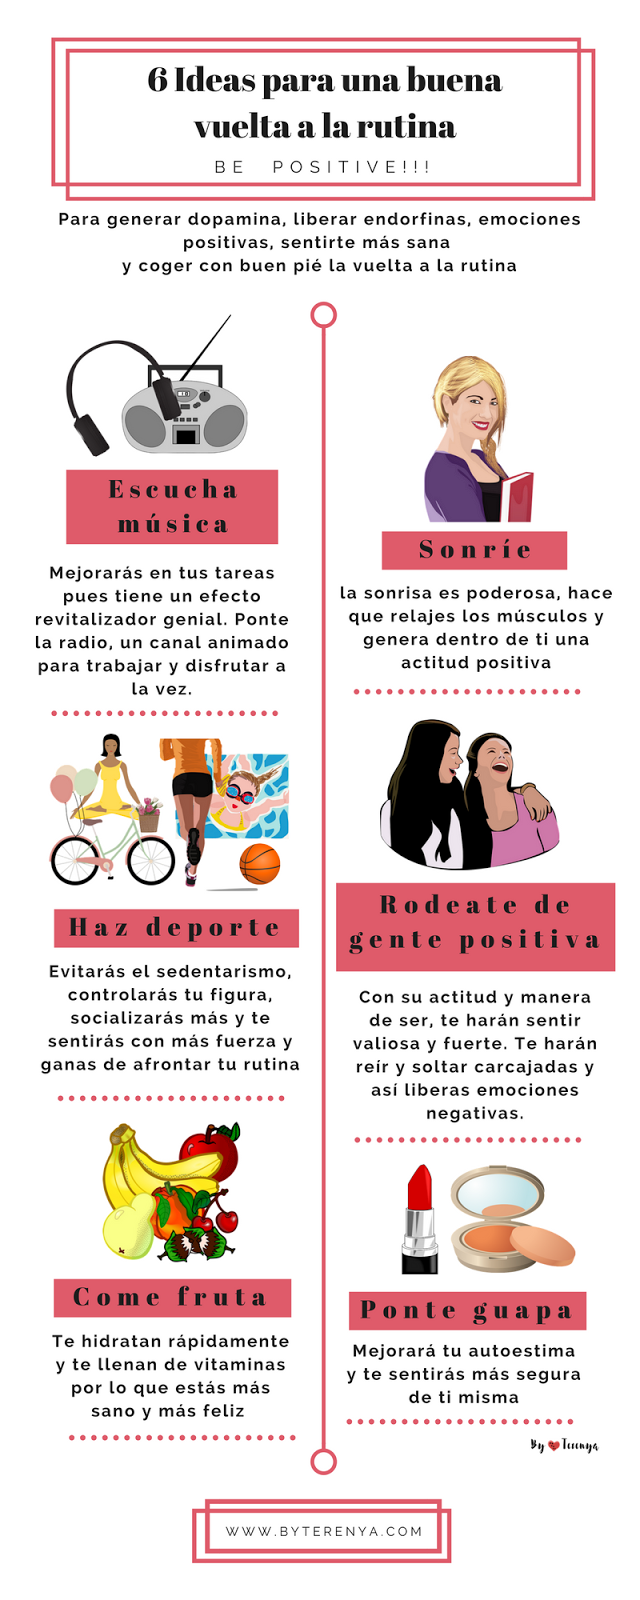 infografia-ideas-vuelta-rutina